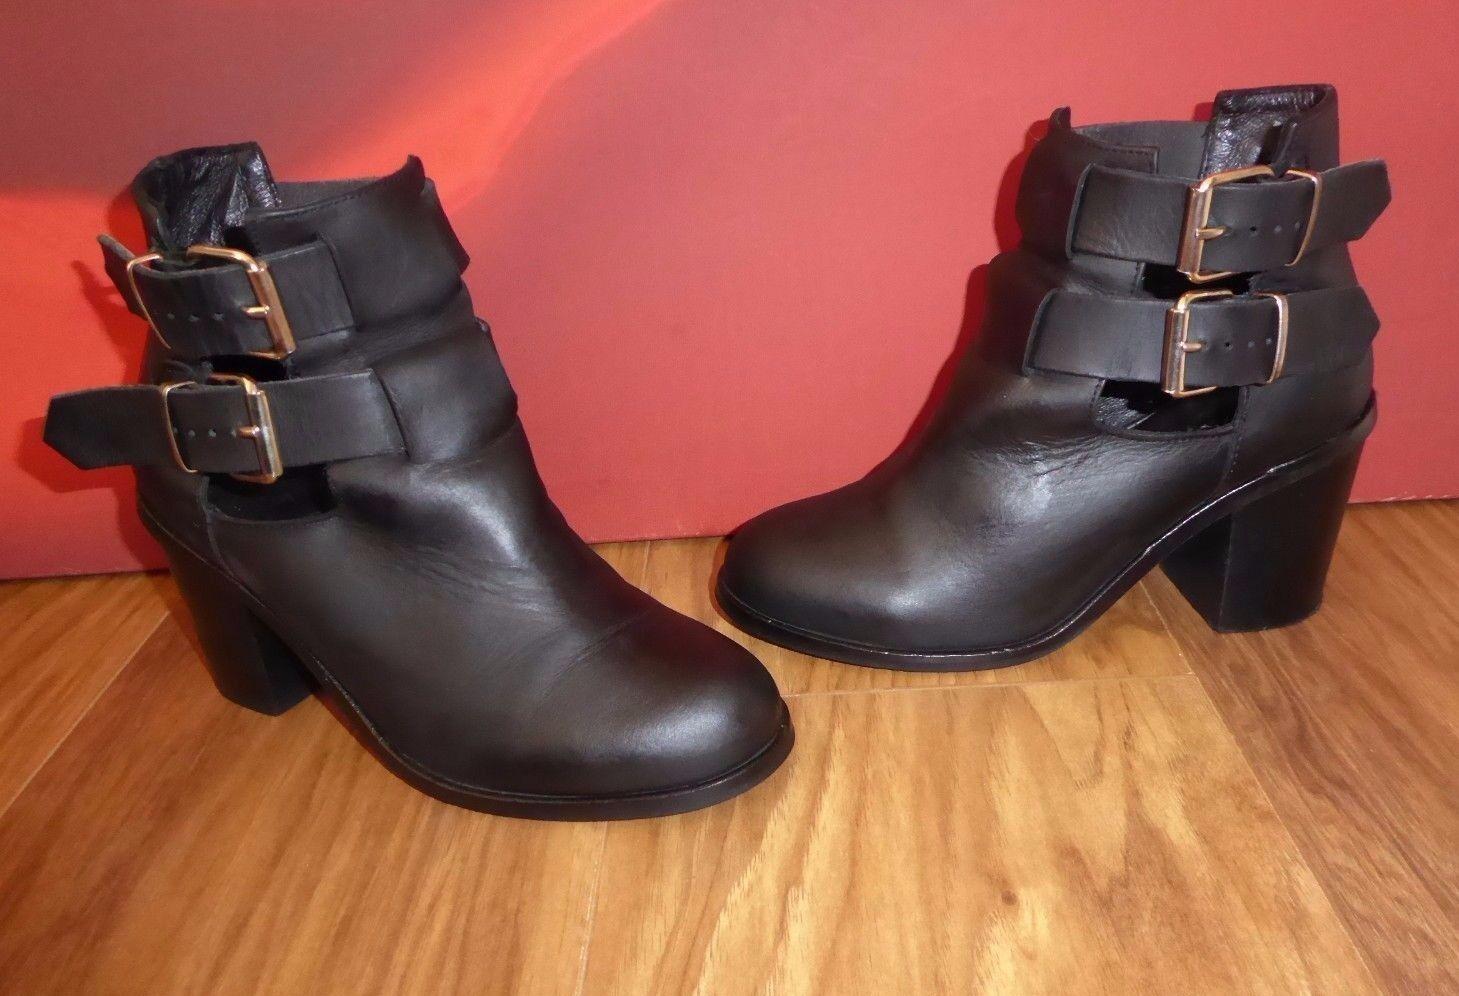 *34* Superb OFFICE Black leather  ankle boots shoes EU 36 UK 3.5